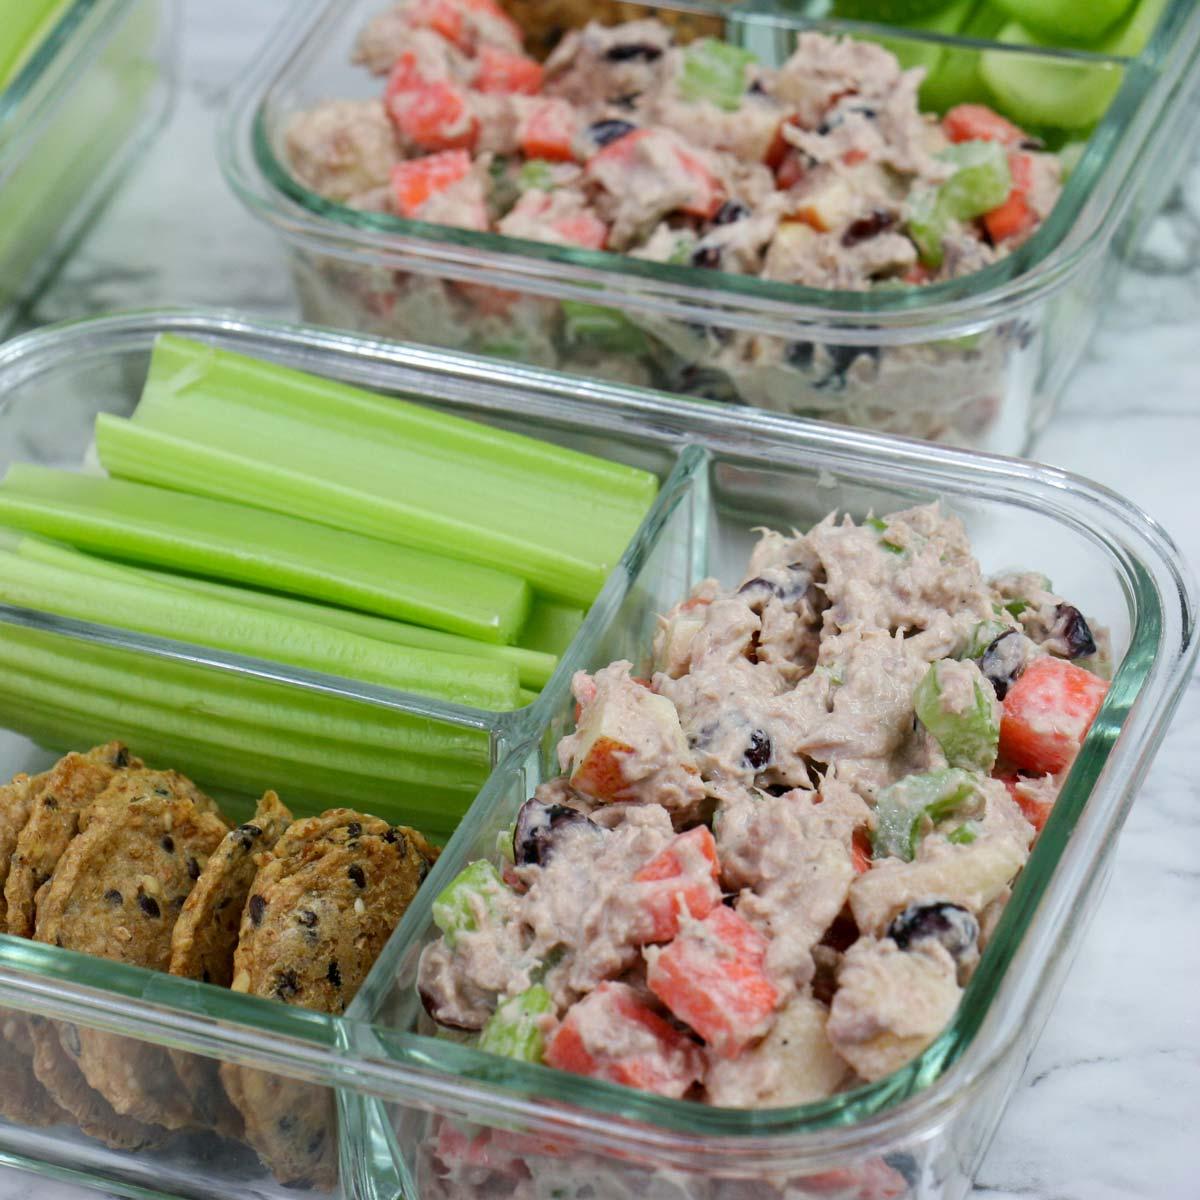 Healthy Tuna Salad with Apple, Veggies, and Cranberries